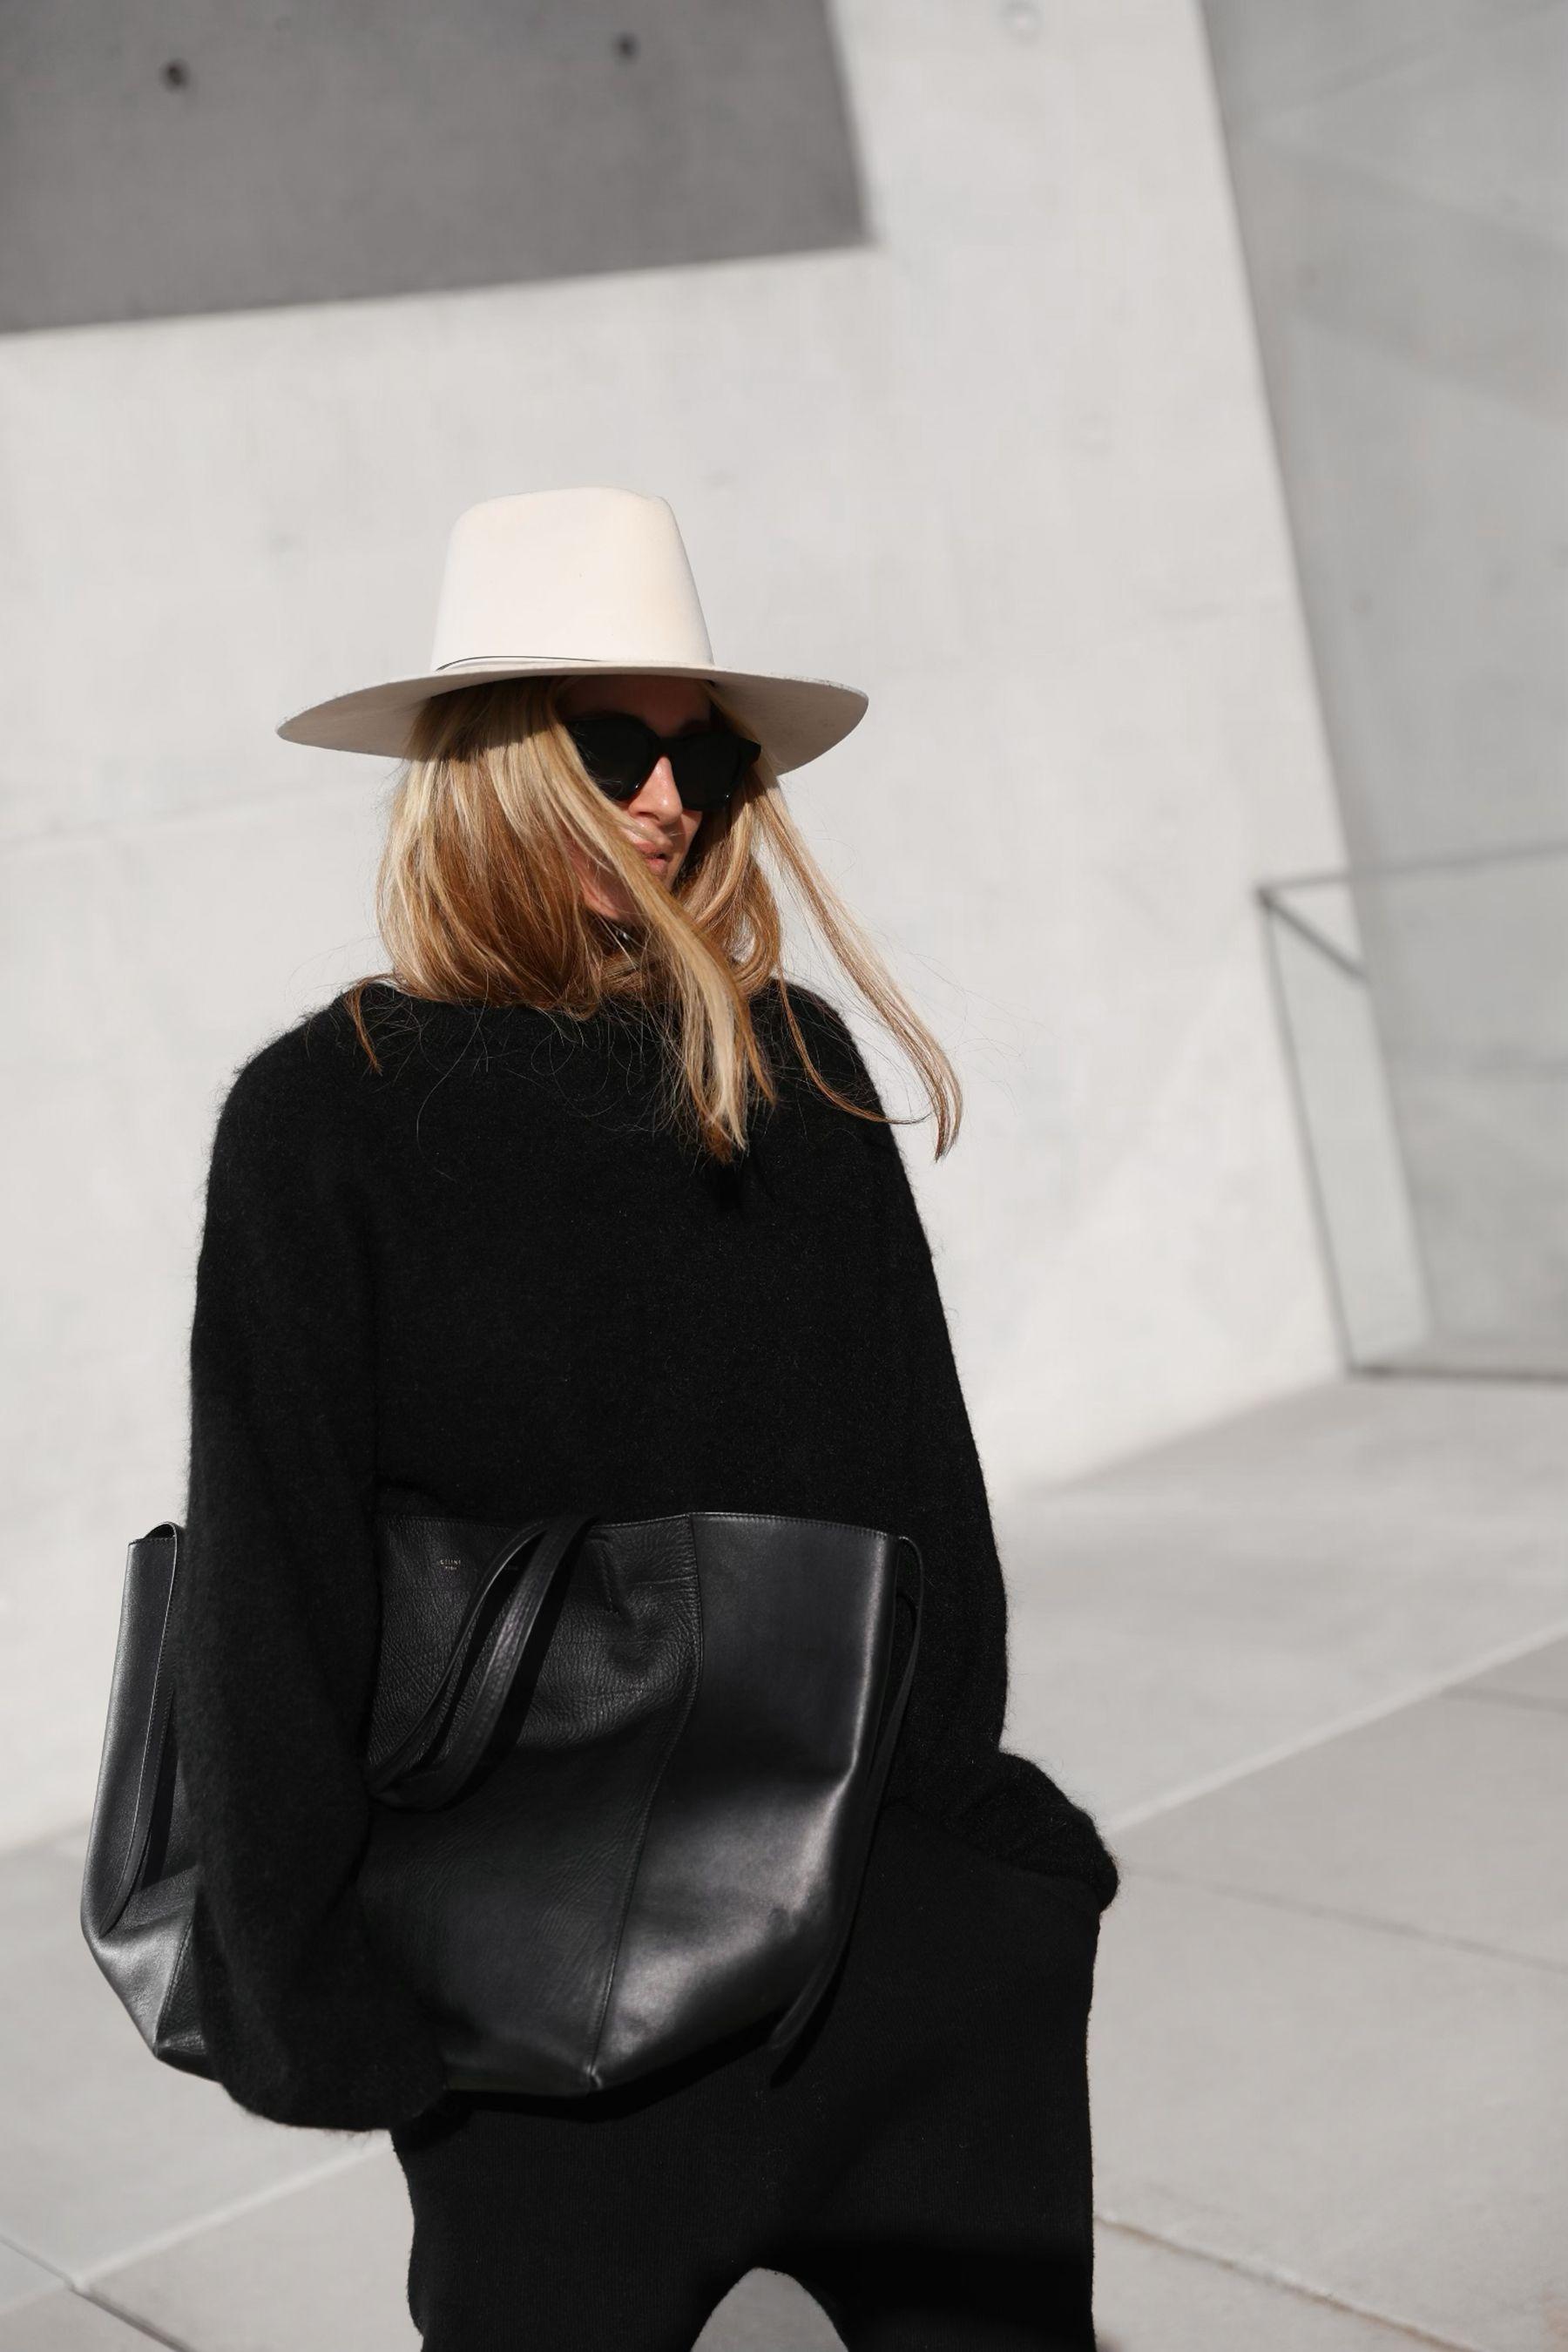 Janessa Leone hat, Céline bag & sunglasses, Acne Studios knit jumper. Via Mija